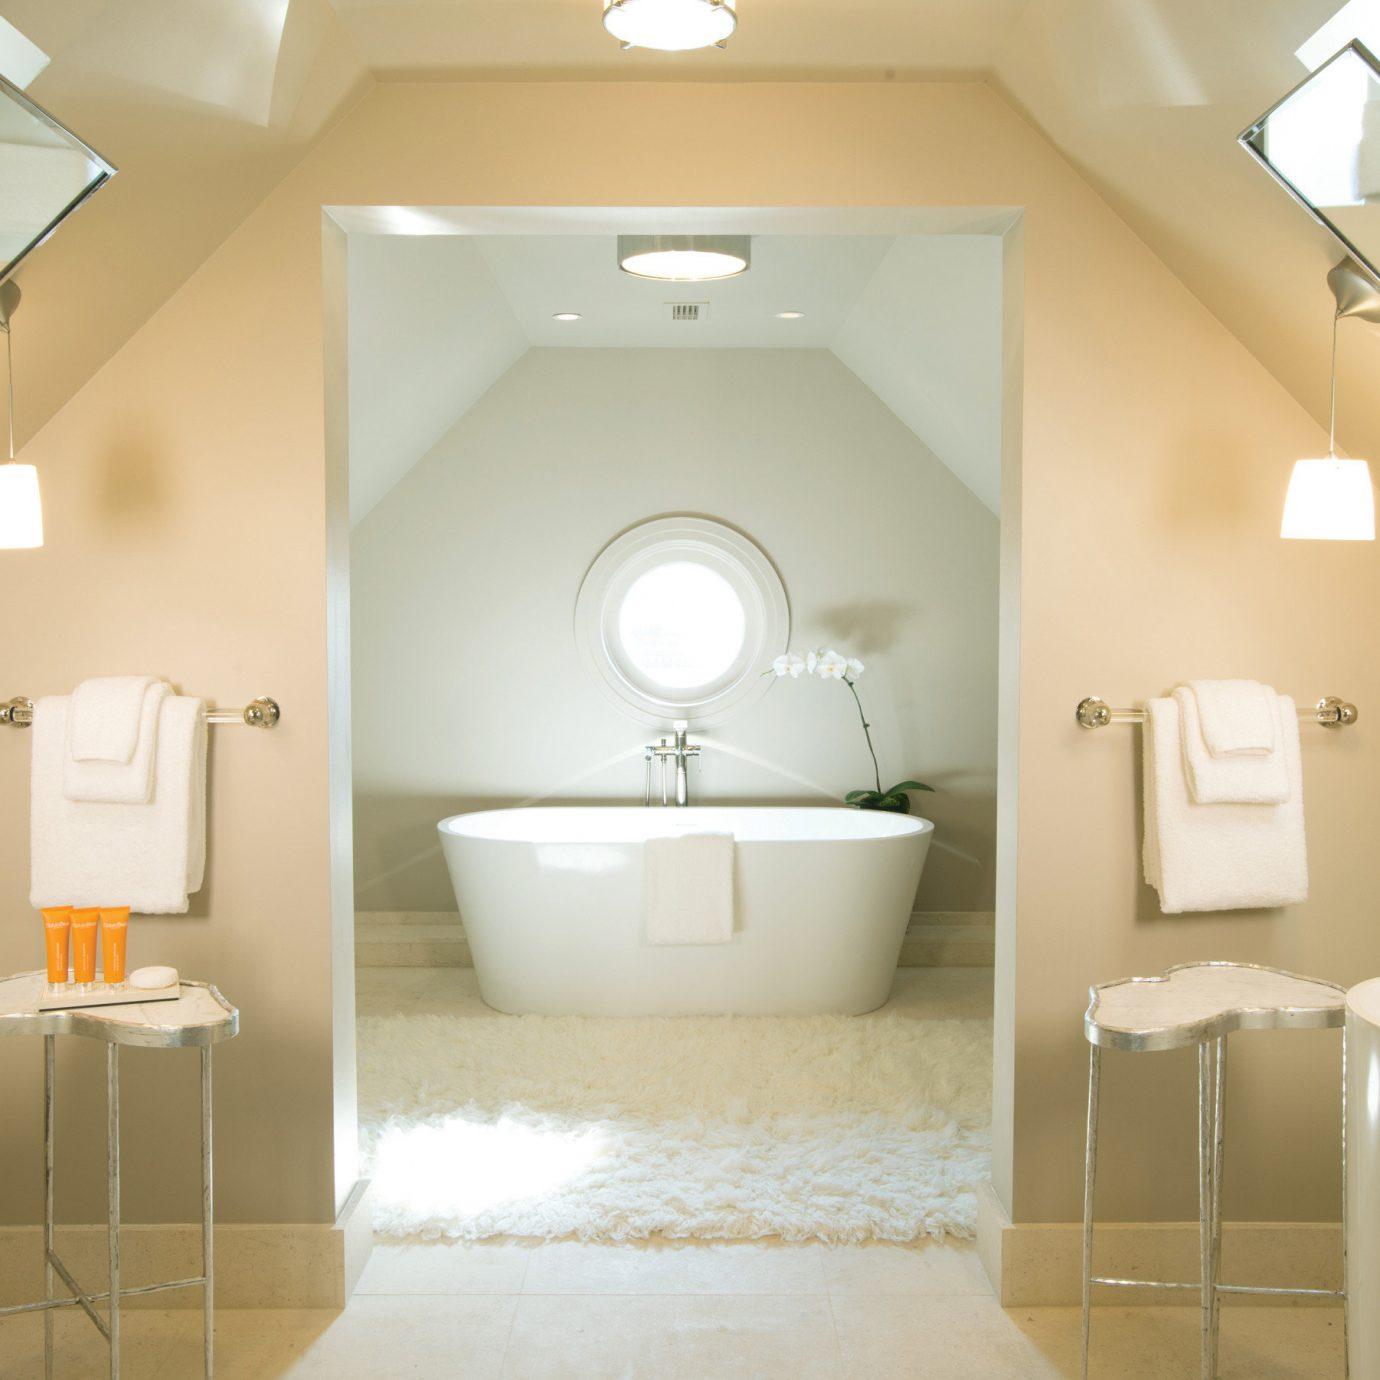 bathroom mirror property toilet sink towel home plumbing fixture rack tan tub